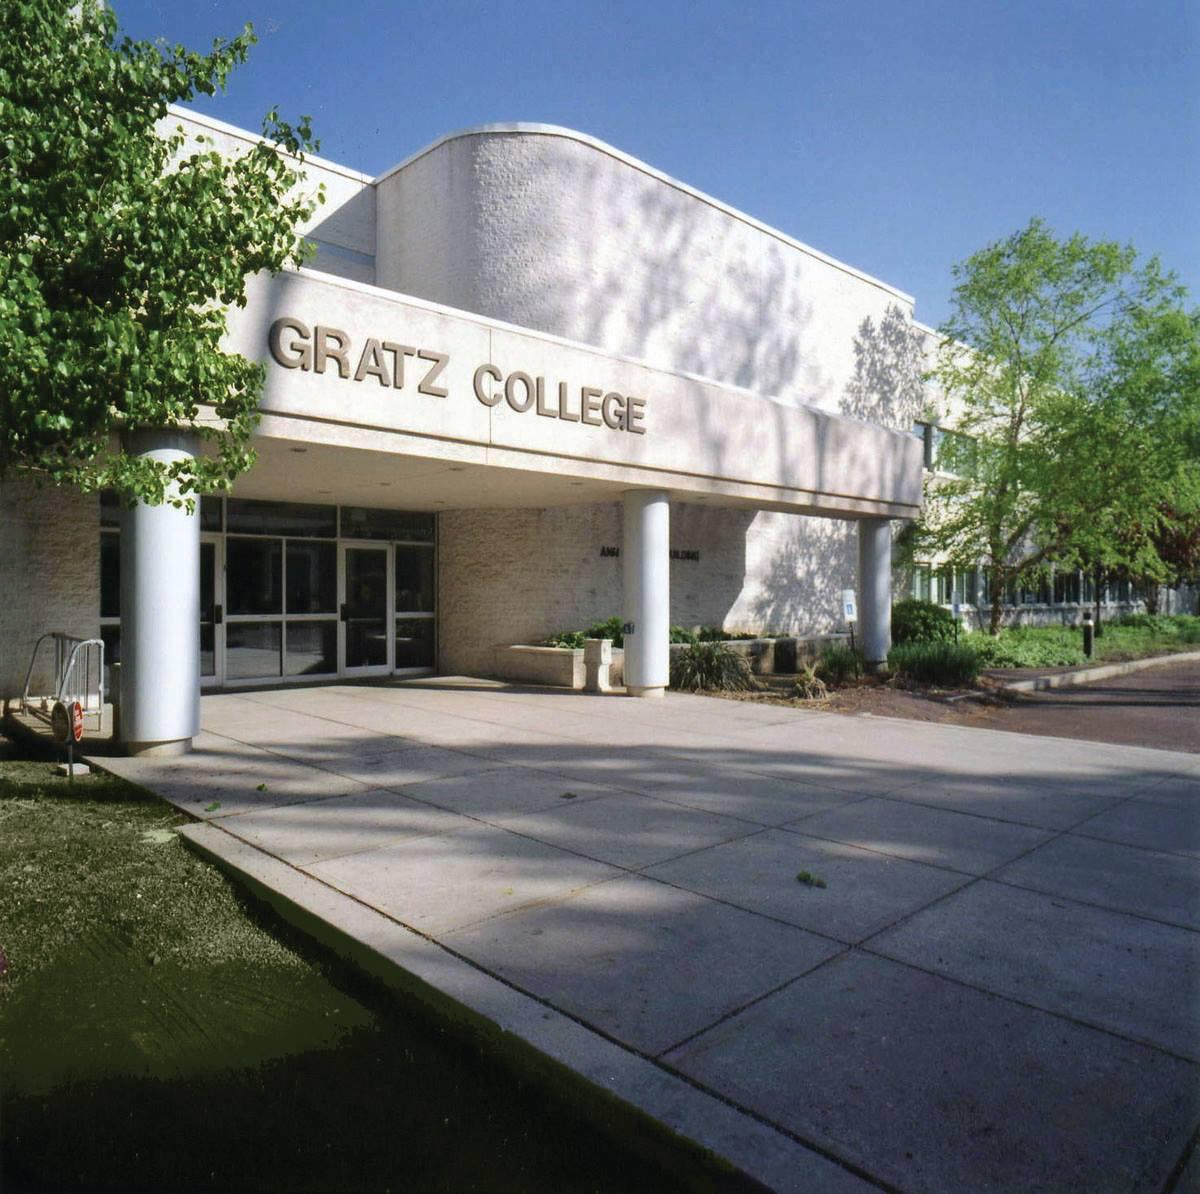 Paul Finkelman named Gratz College's new president